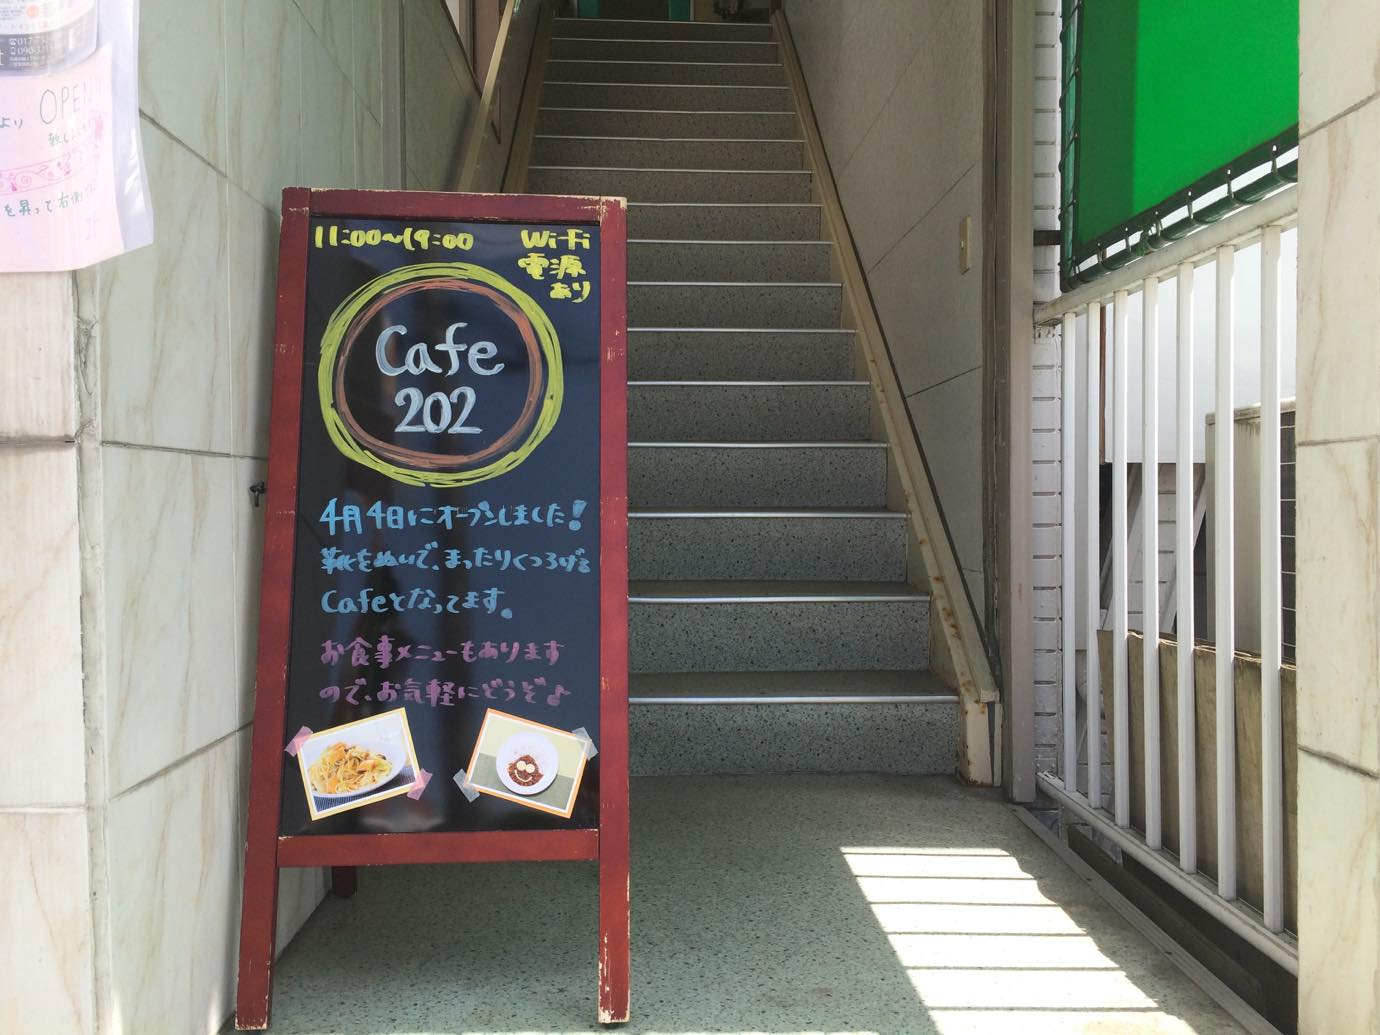 Cafe202 01 20150425 123754